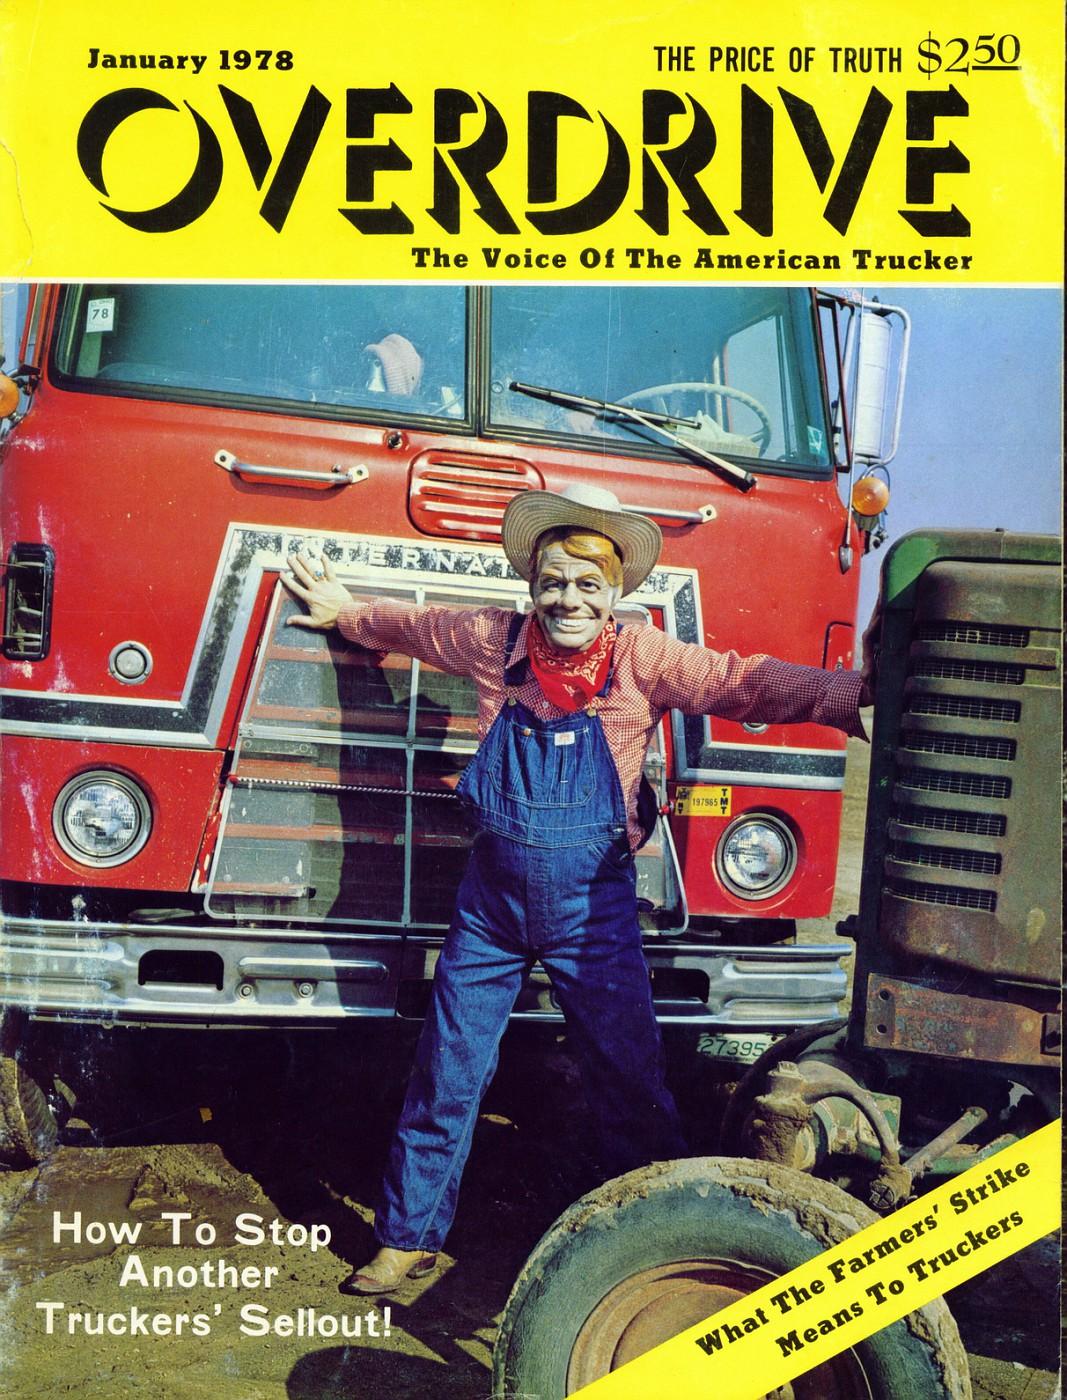 Vintage overdrive magazine